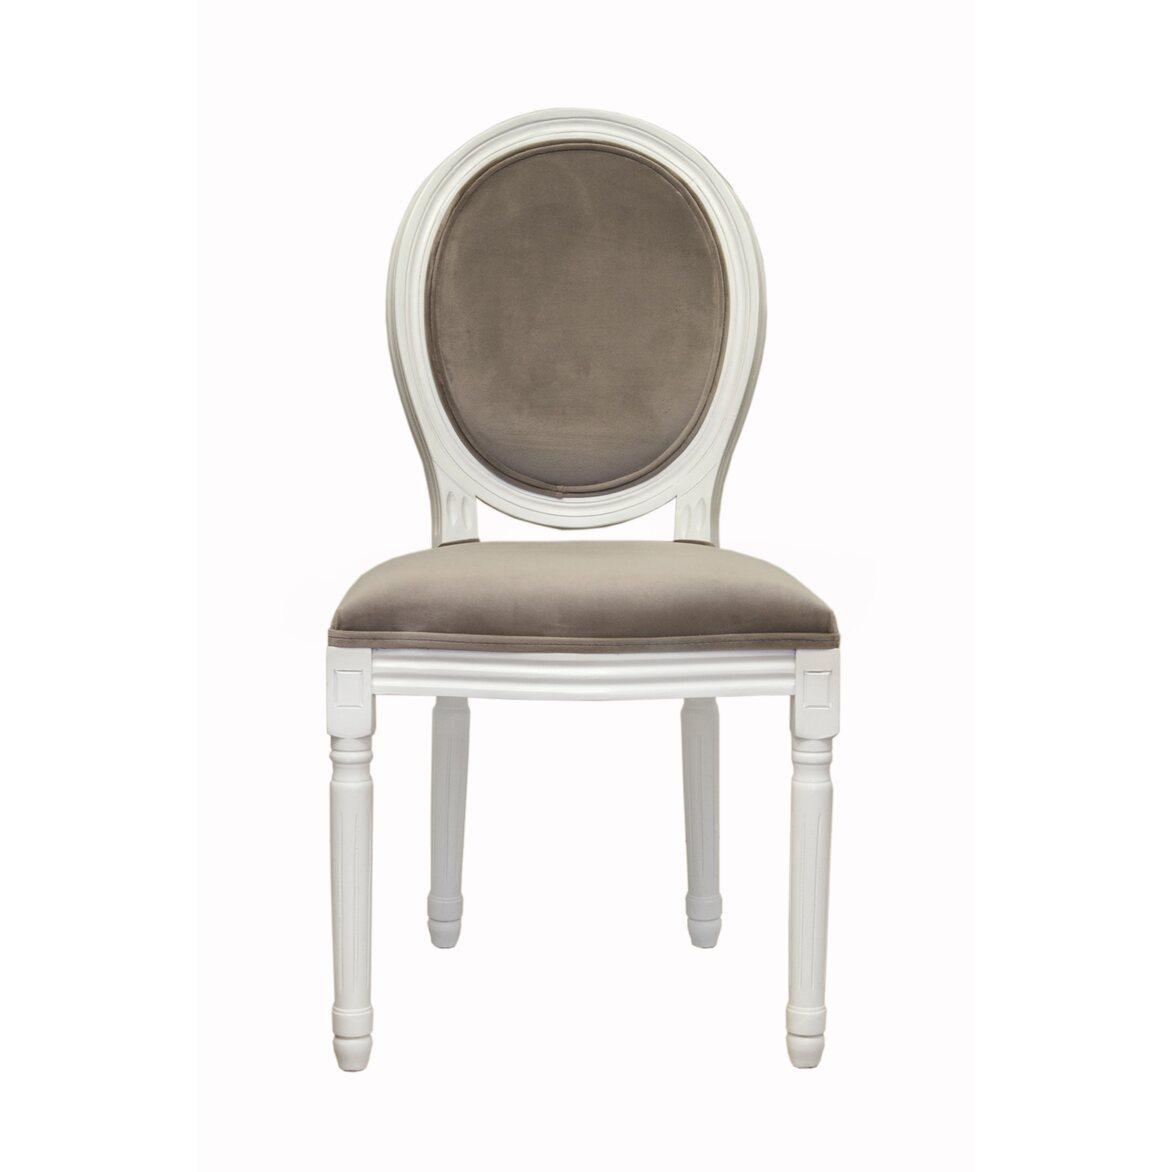 Стул Volker taupe | Обеденные стулья Kingsby